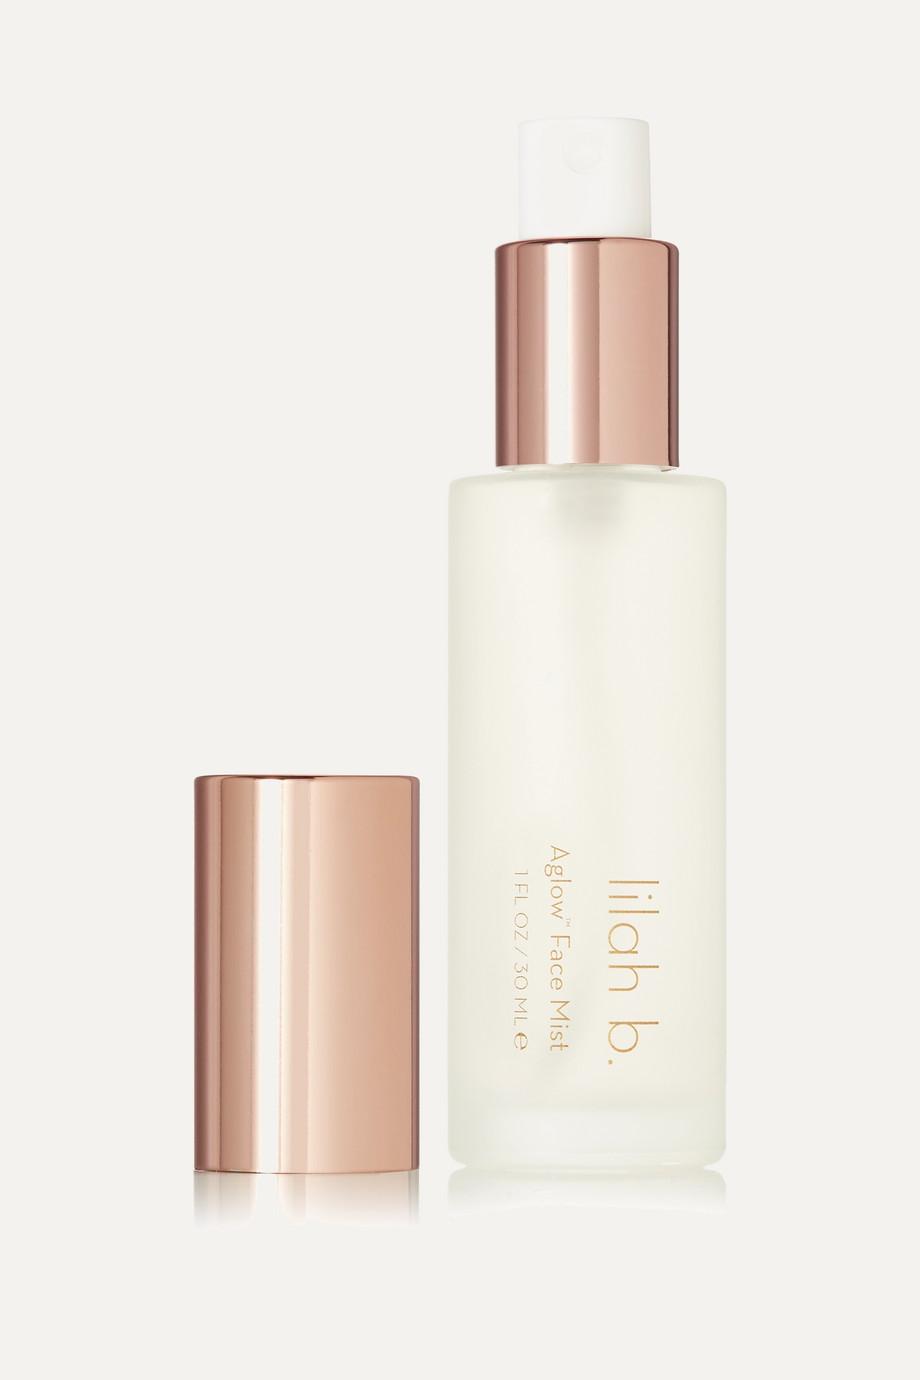 Lilah B. Aglow™ Face Mist, 30 ml – Gesichtsspray